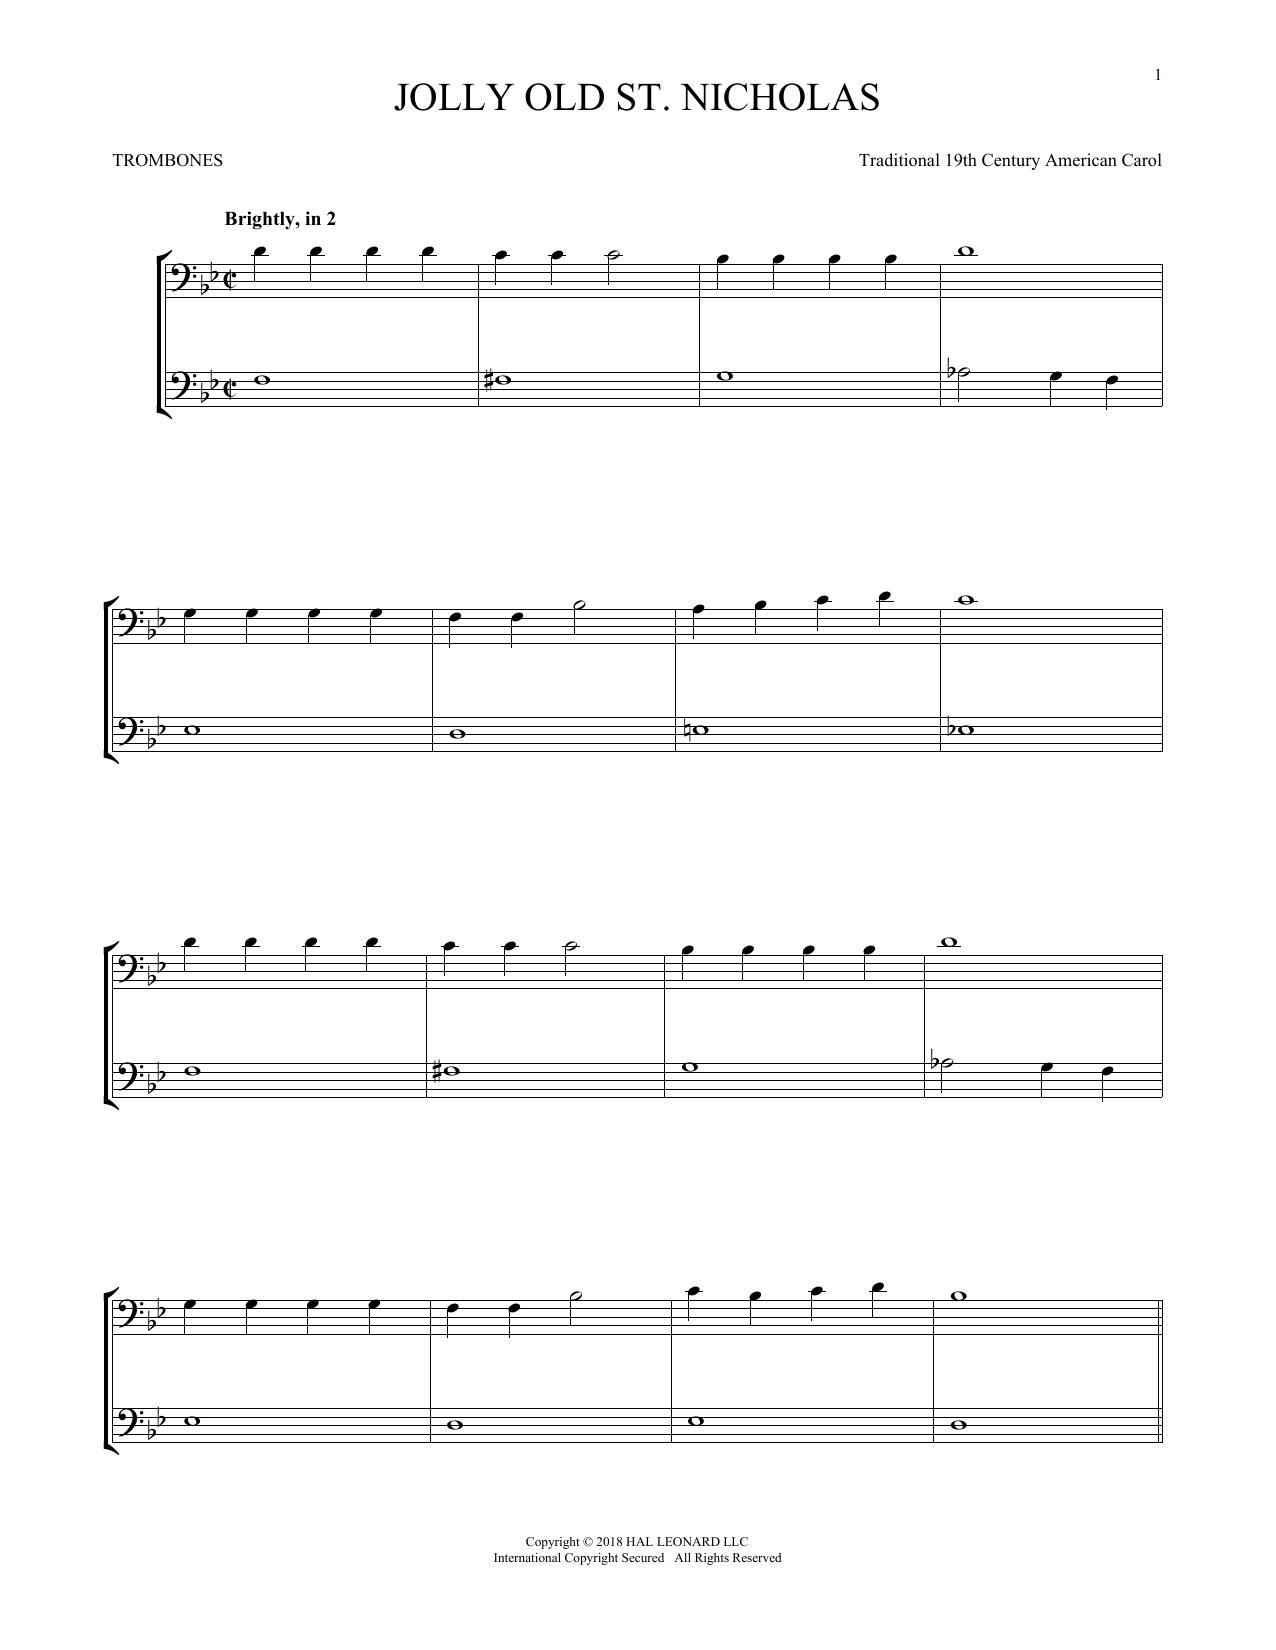 Jolly Old St. Nicholas (Trombone Transcription)